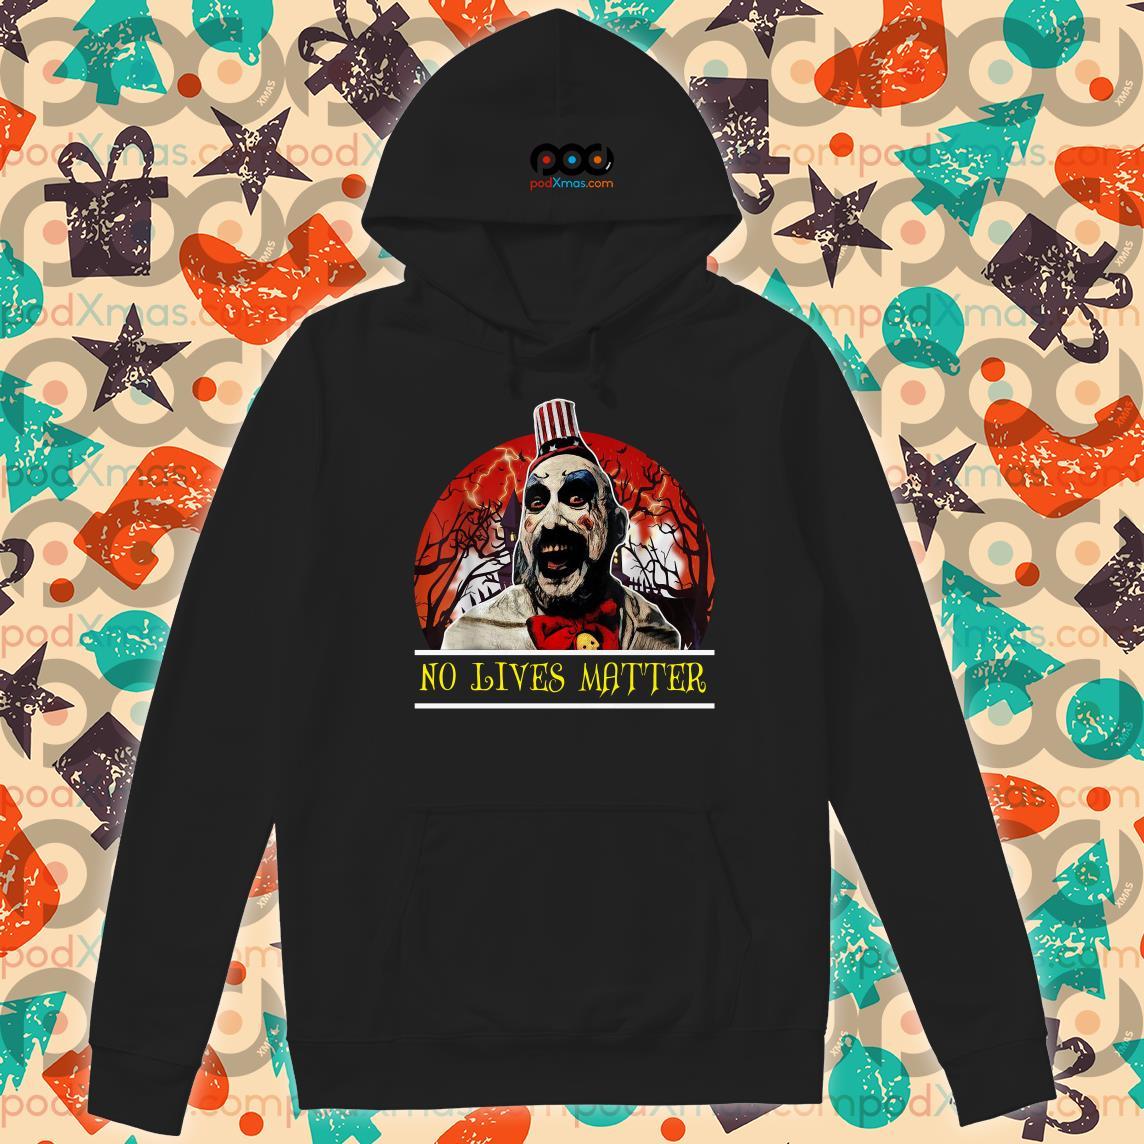 Captain Spaulding No lives matter hoodie